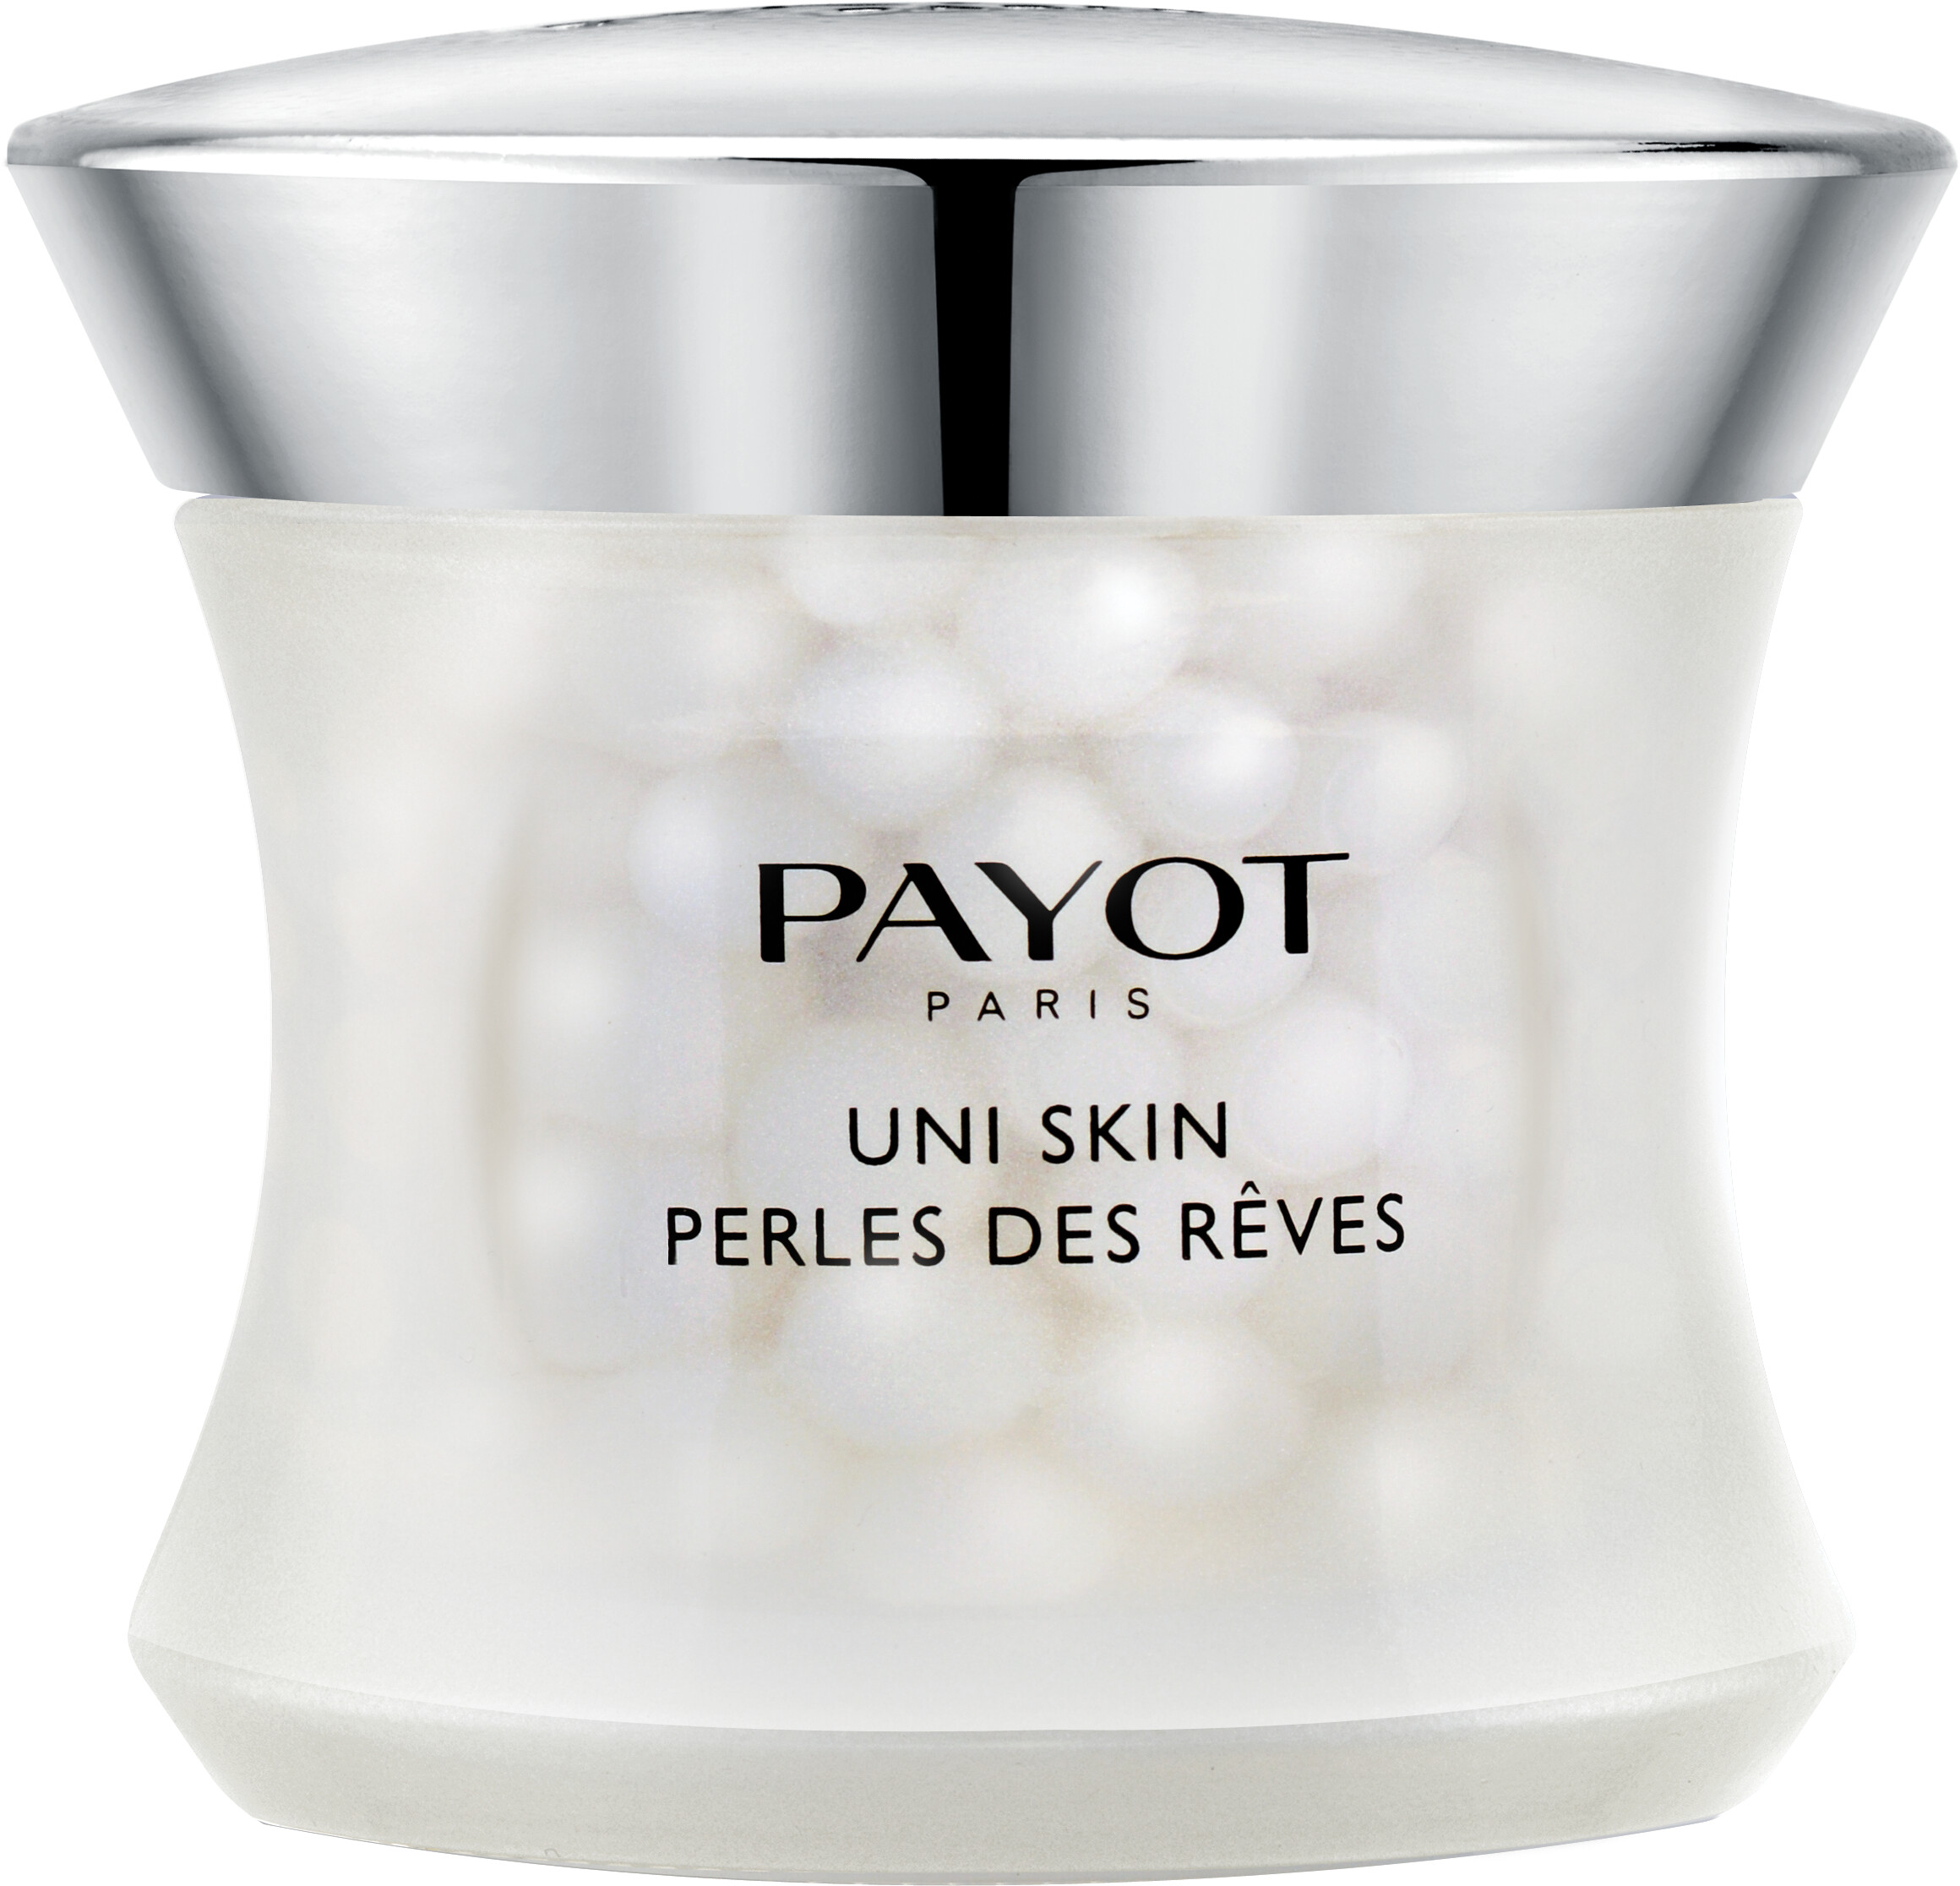 PAYOT Uni Skin Perles Des Reves Perfector Dark Spot Corrector Night Care 38g